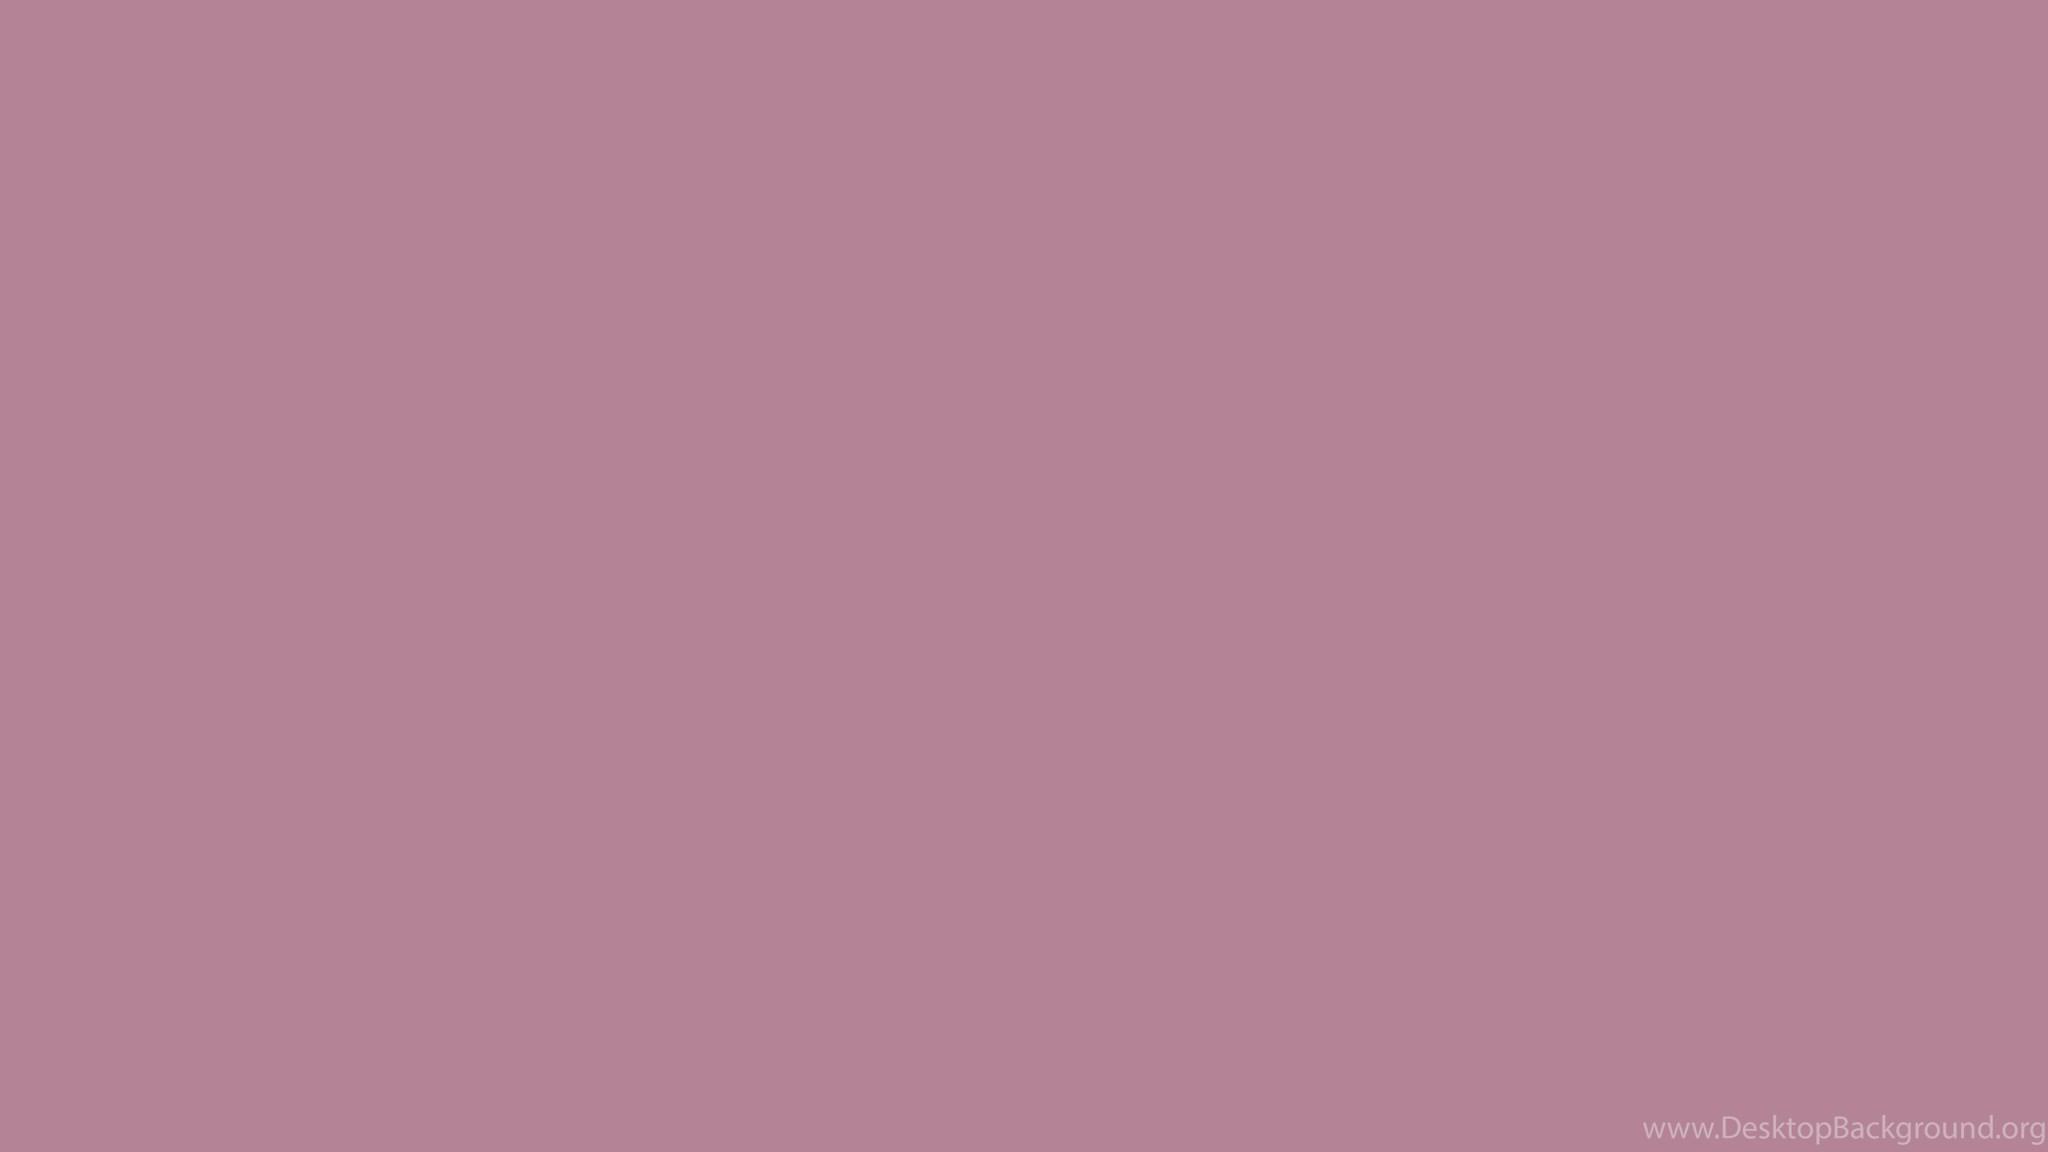 Solid color lavender 2560x1440 english lavender solid ...